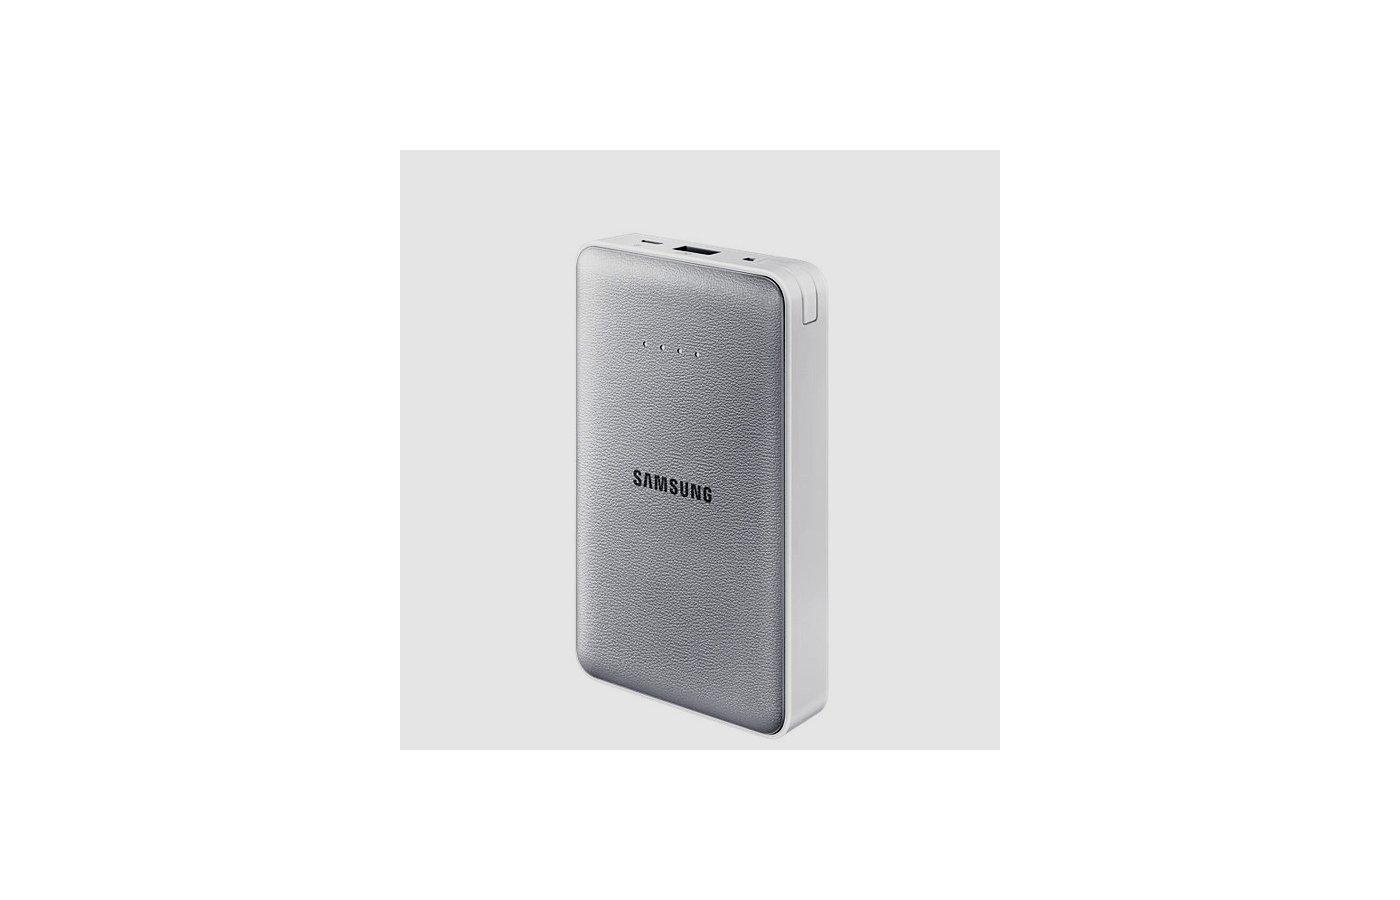 Портативный аккумулятор Samsung EB-PN915 11.3mAh серый (EB-PN915BSRGRU)